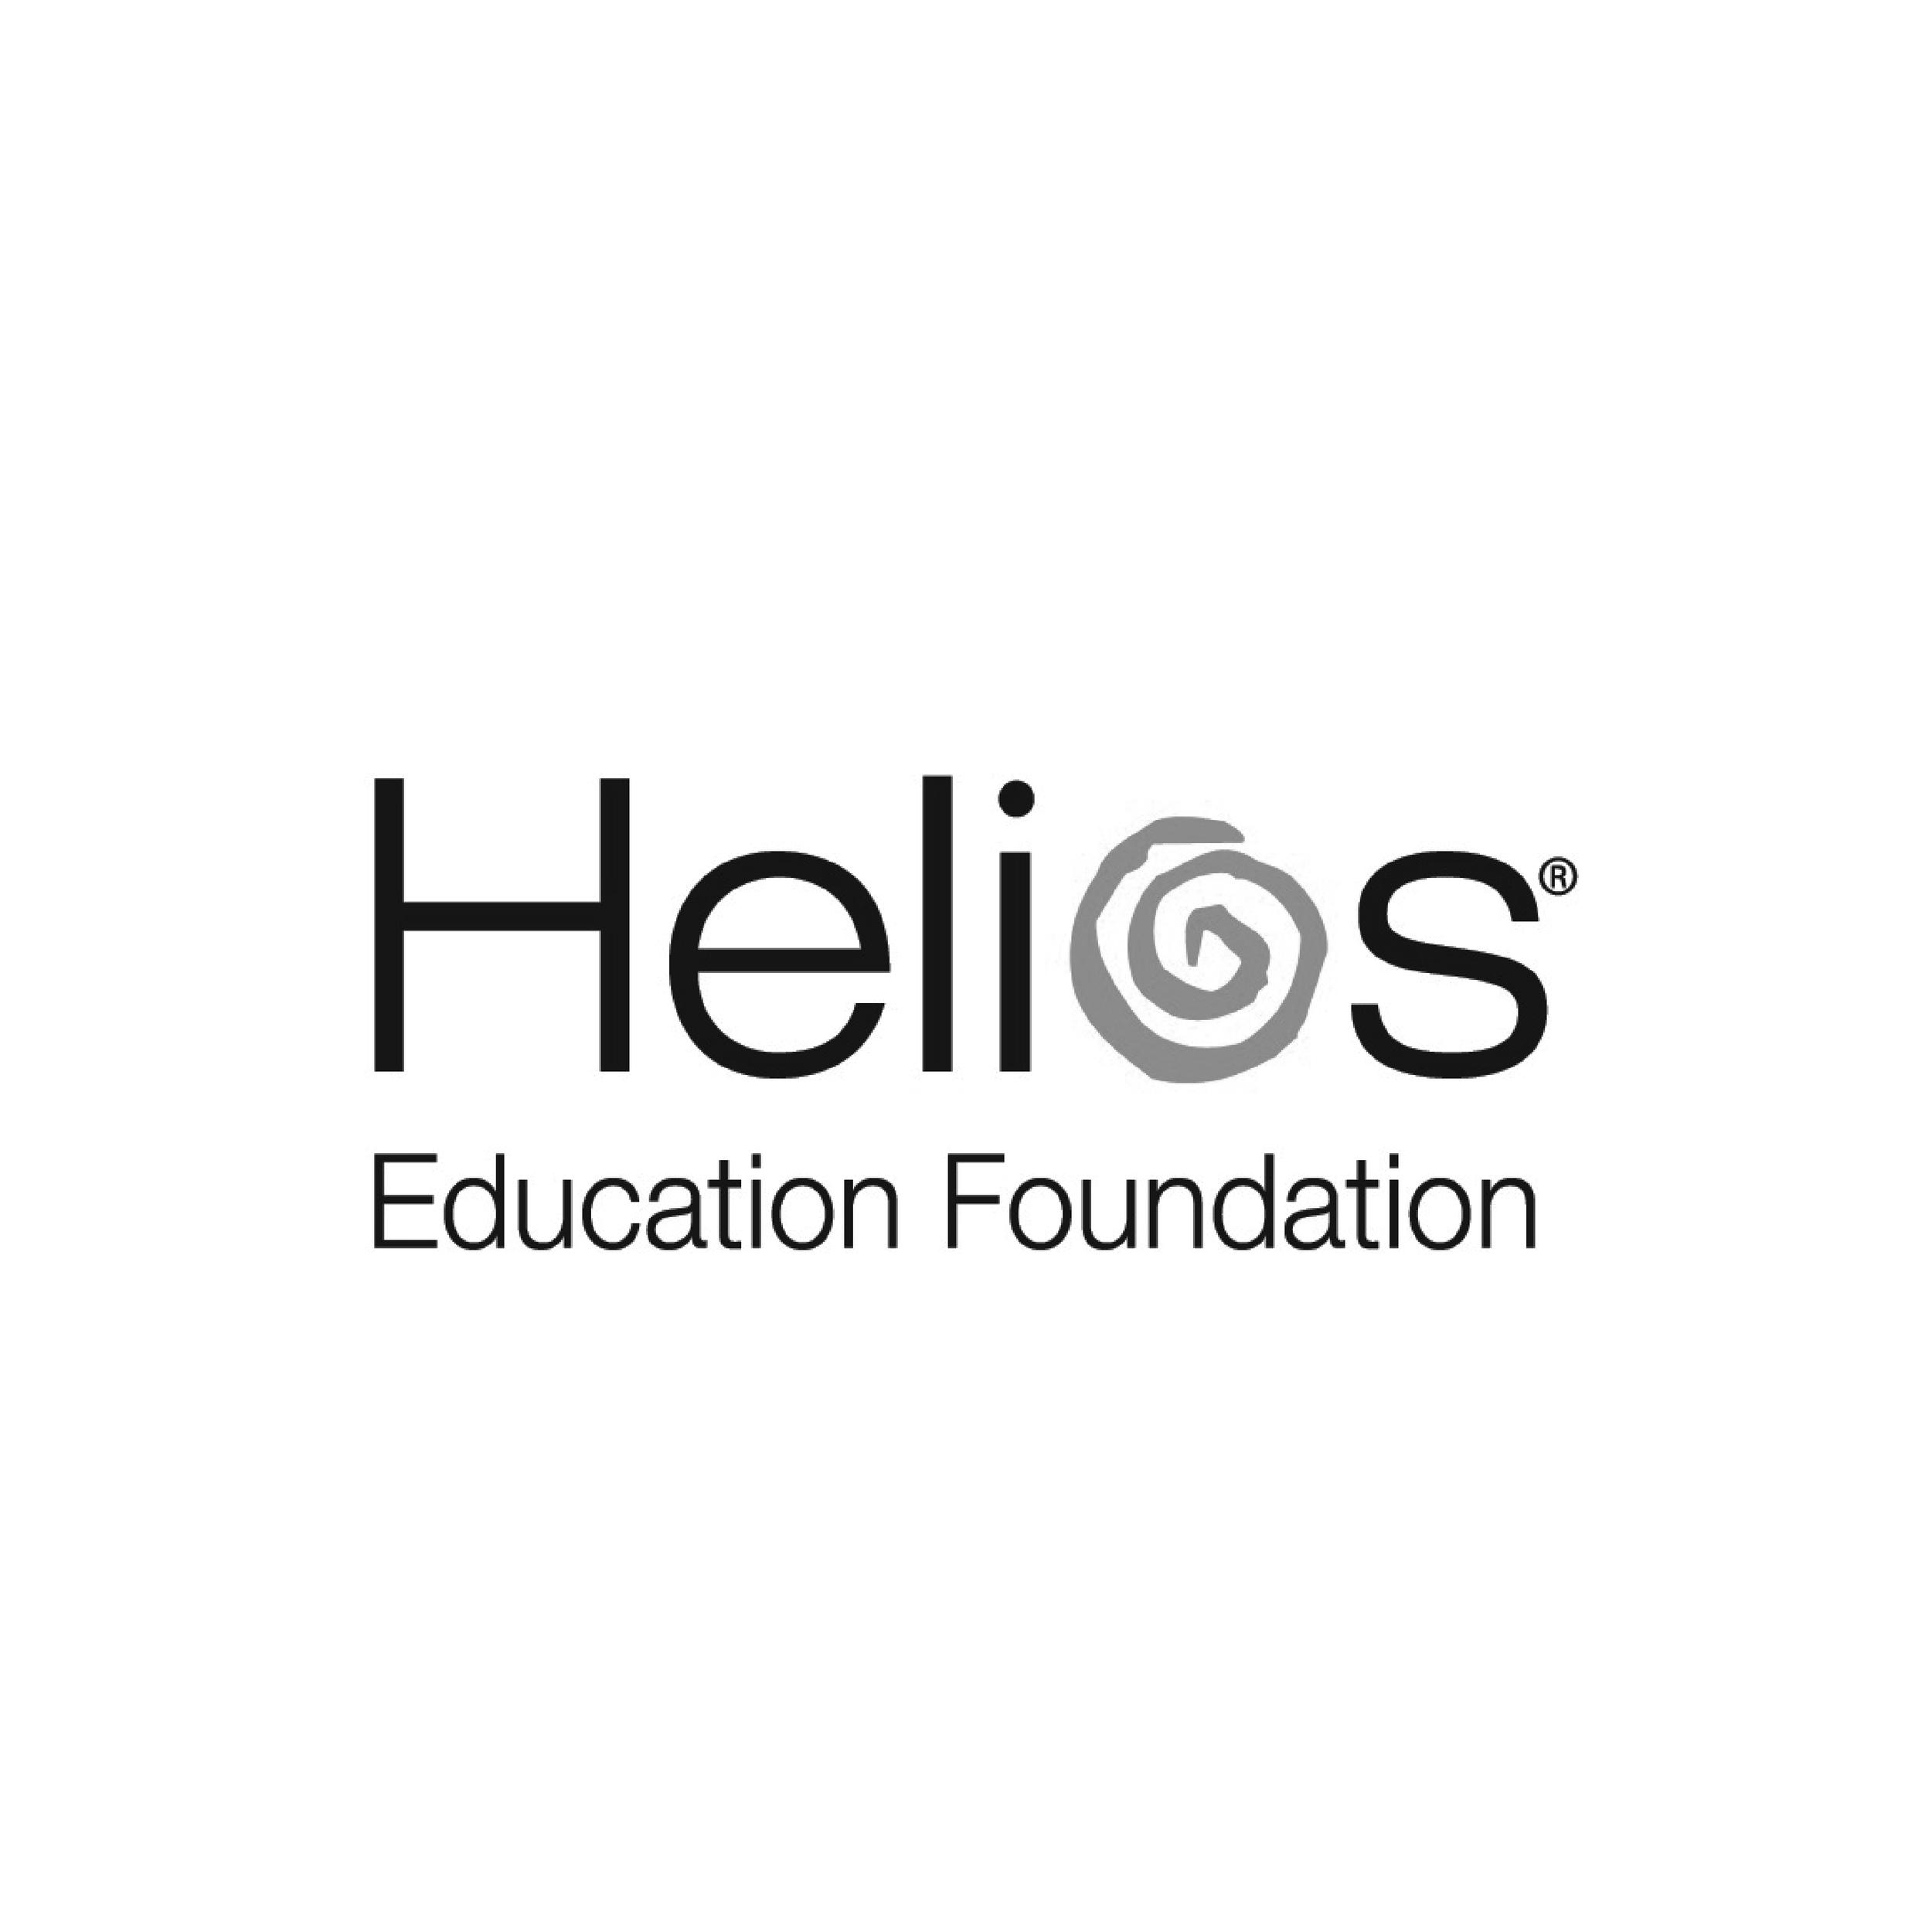 ImpactMaker_Supporter_logos_helios.png